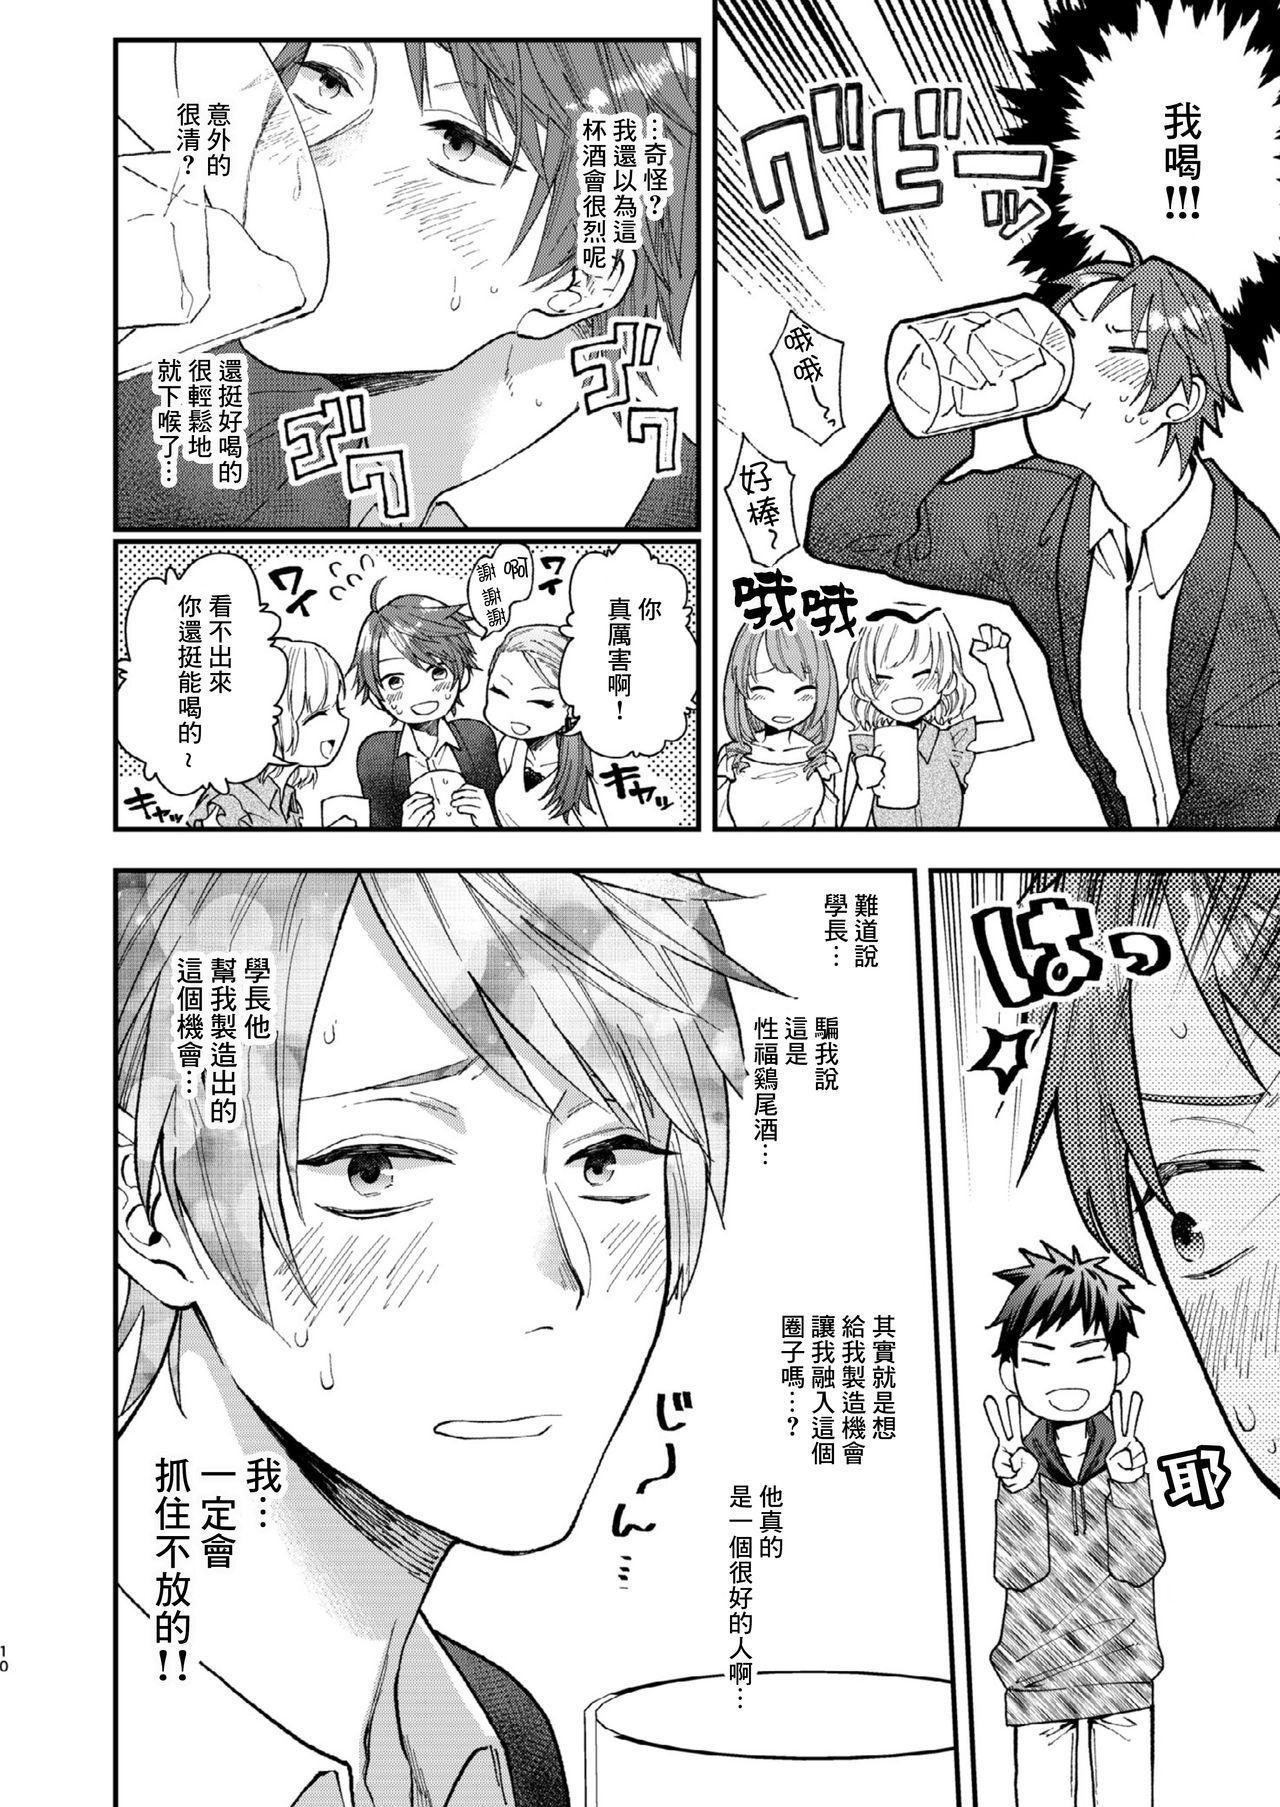 Tonde Hiniiru Yarimokonke   跳入火坑的约炮直男 7